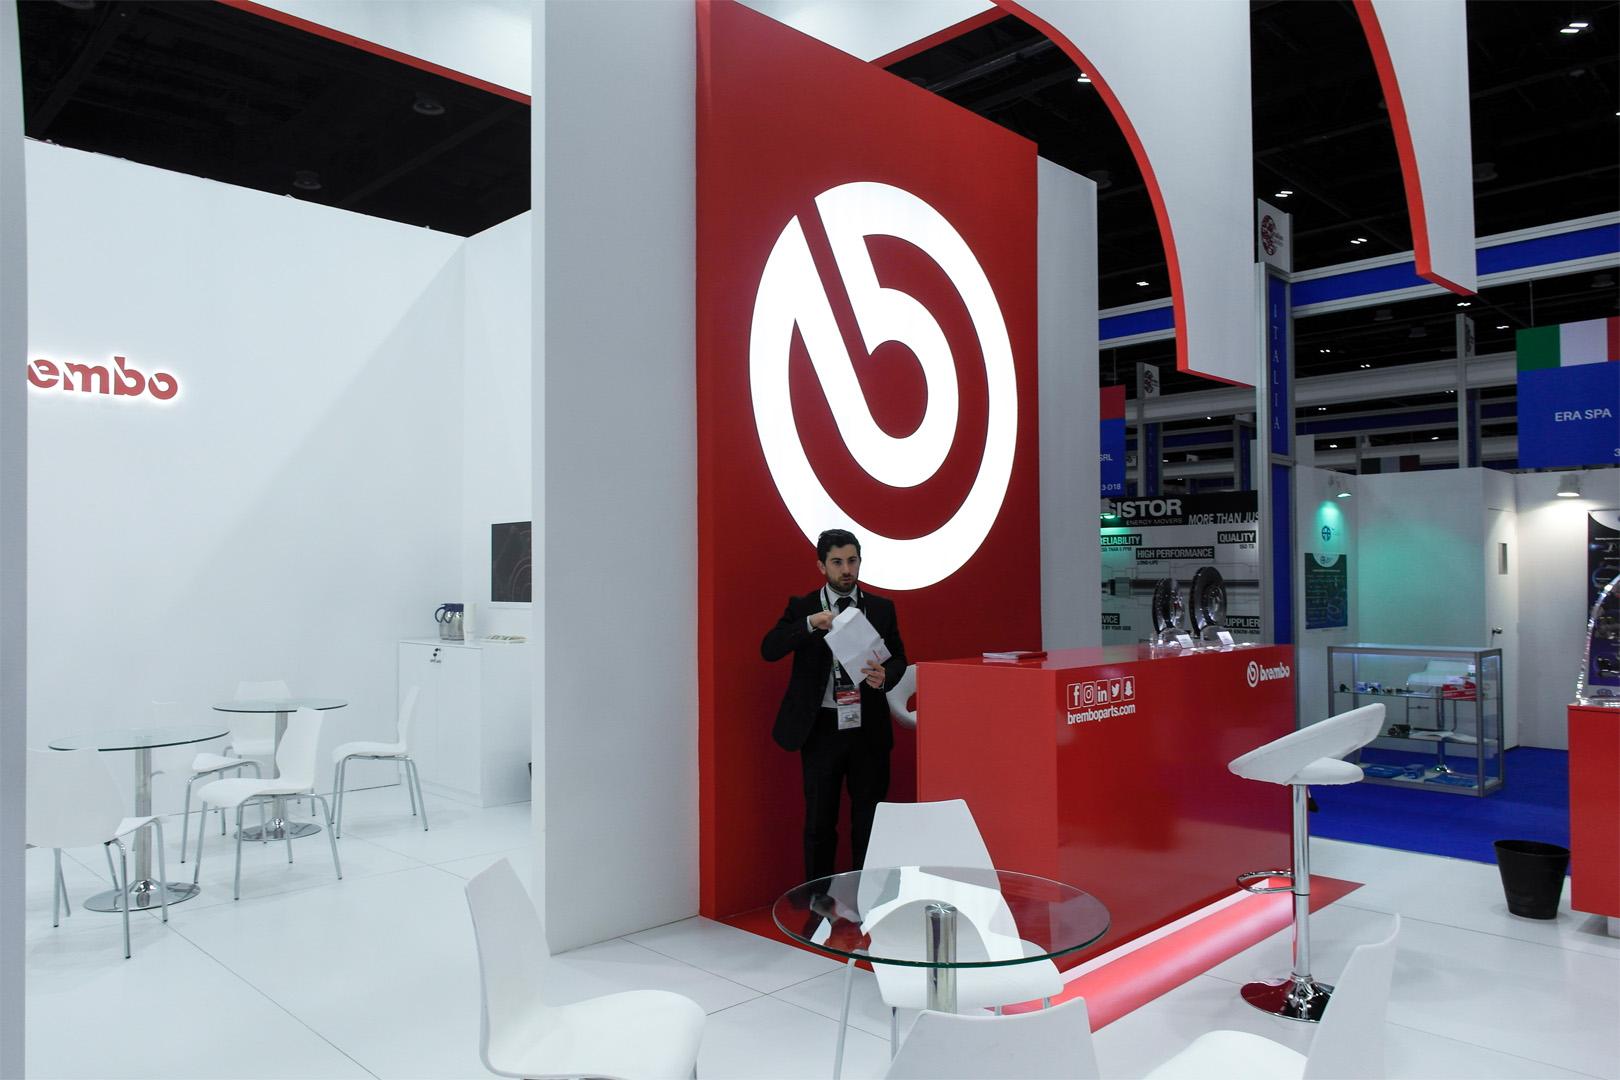 Exhibition Stand Design Lebanon : Hospitality exhibition stand design atm u celine sbdesign